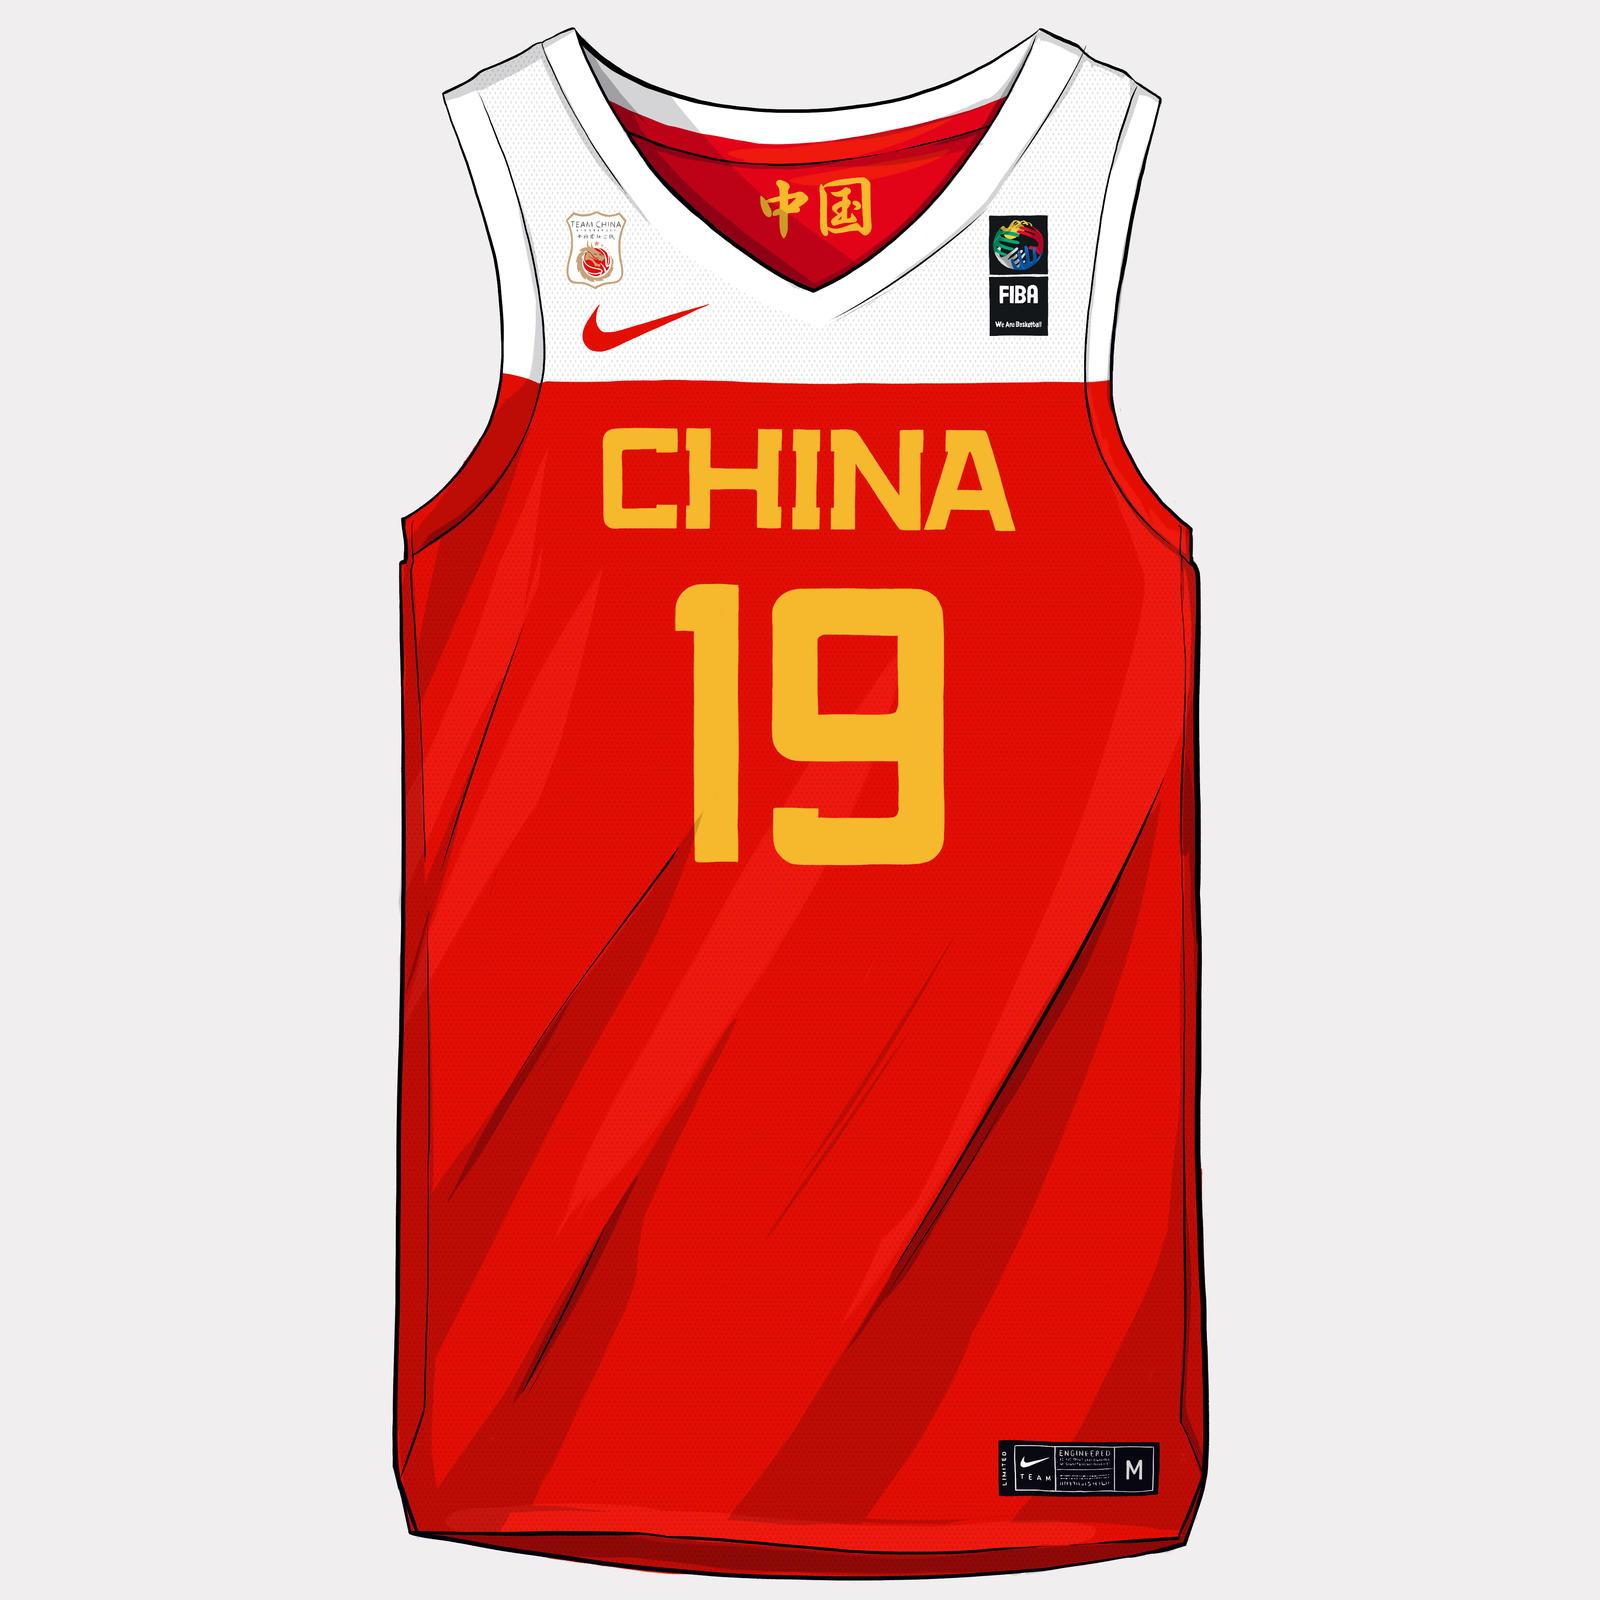 NikeNews_China19BasketballUniforms_chinared1x1v2_square_1600.jpg